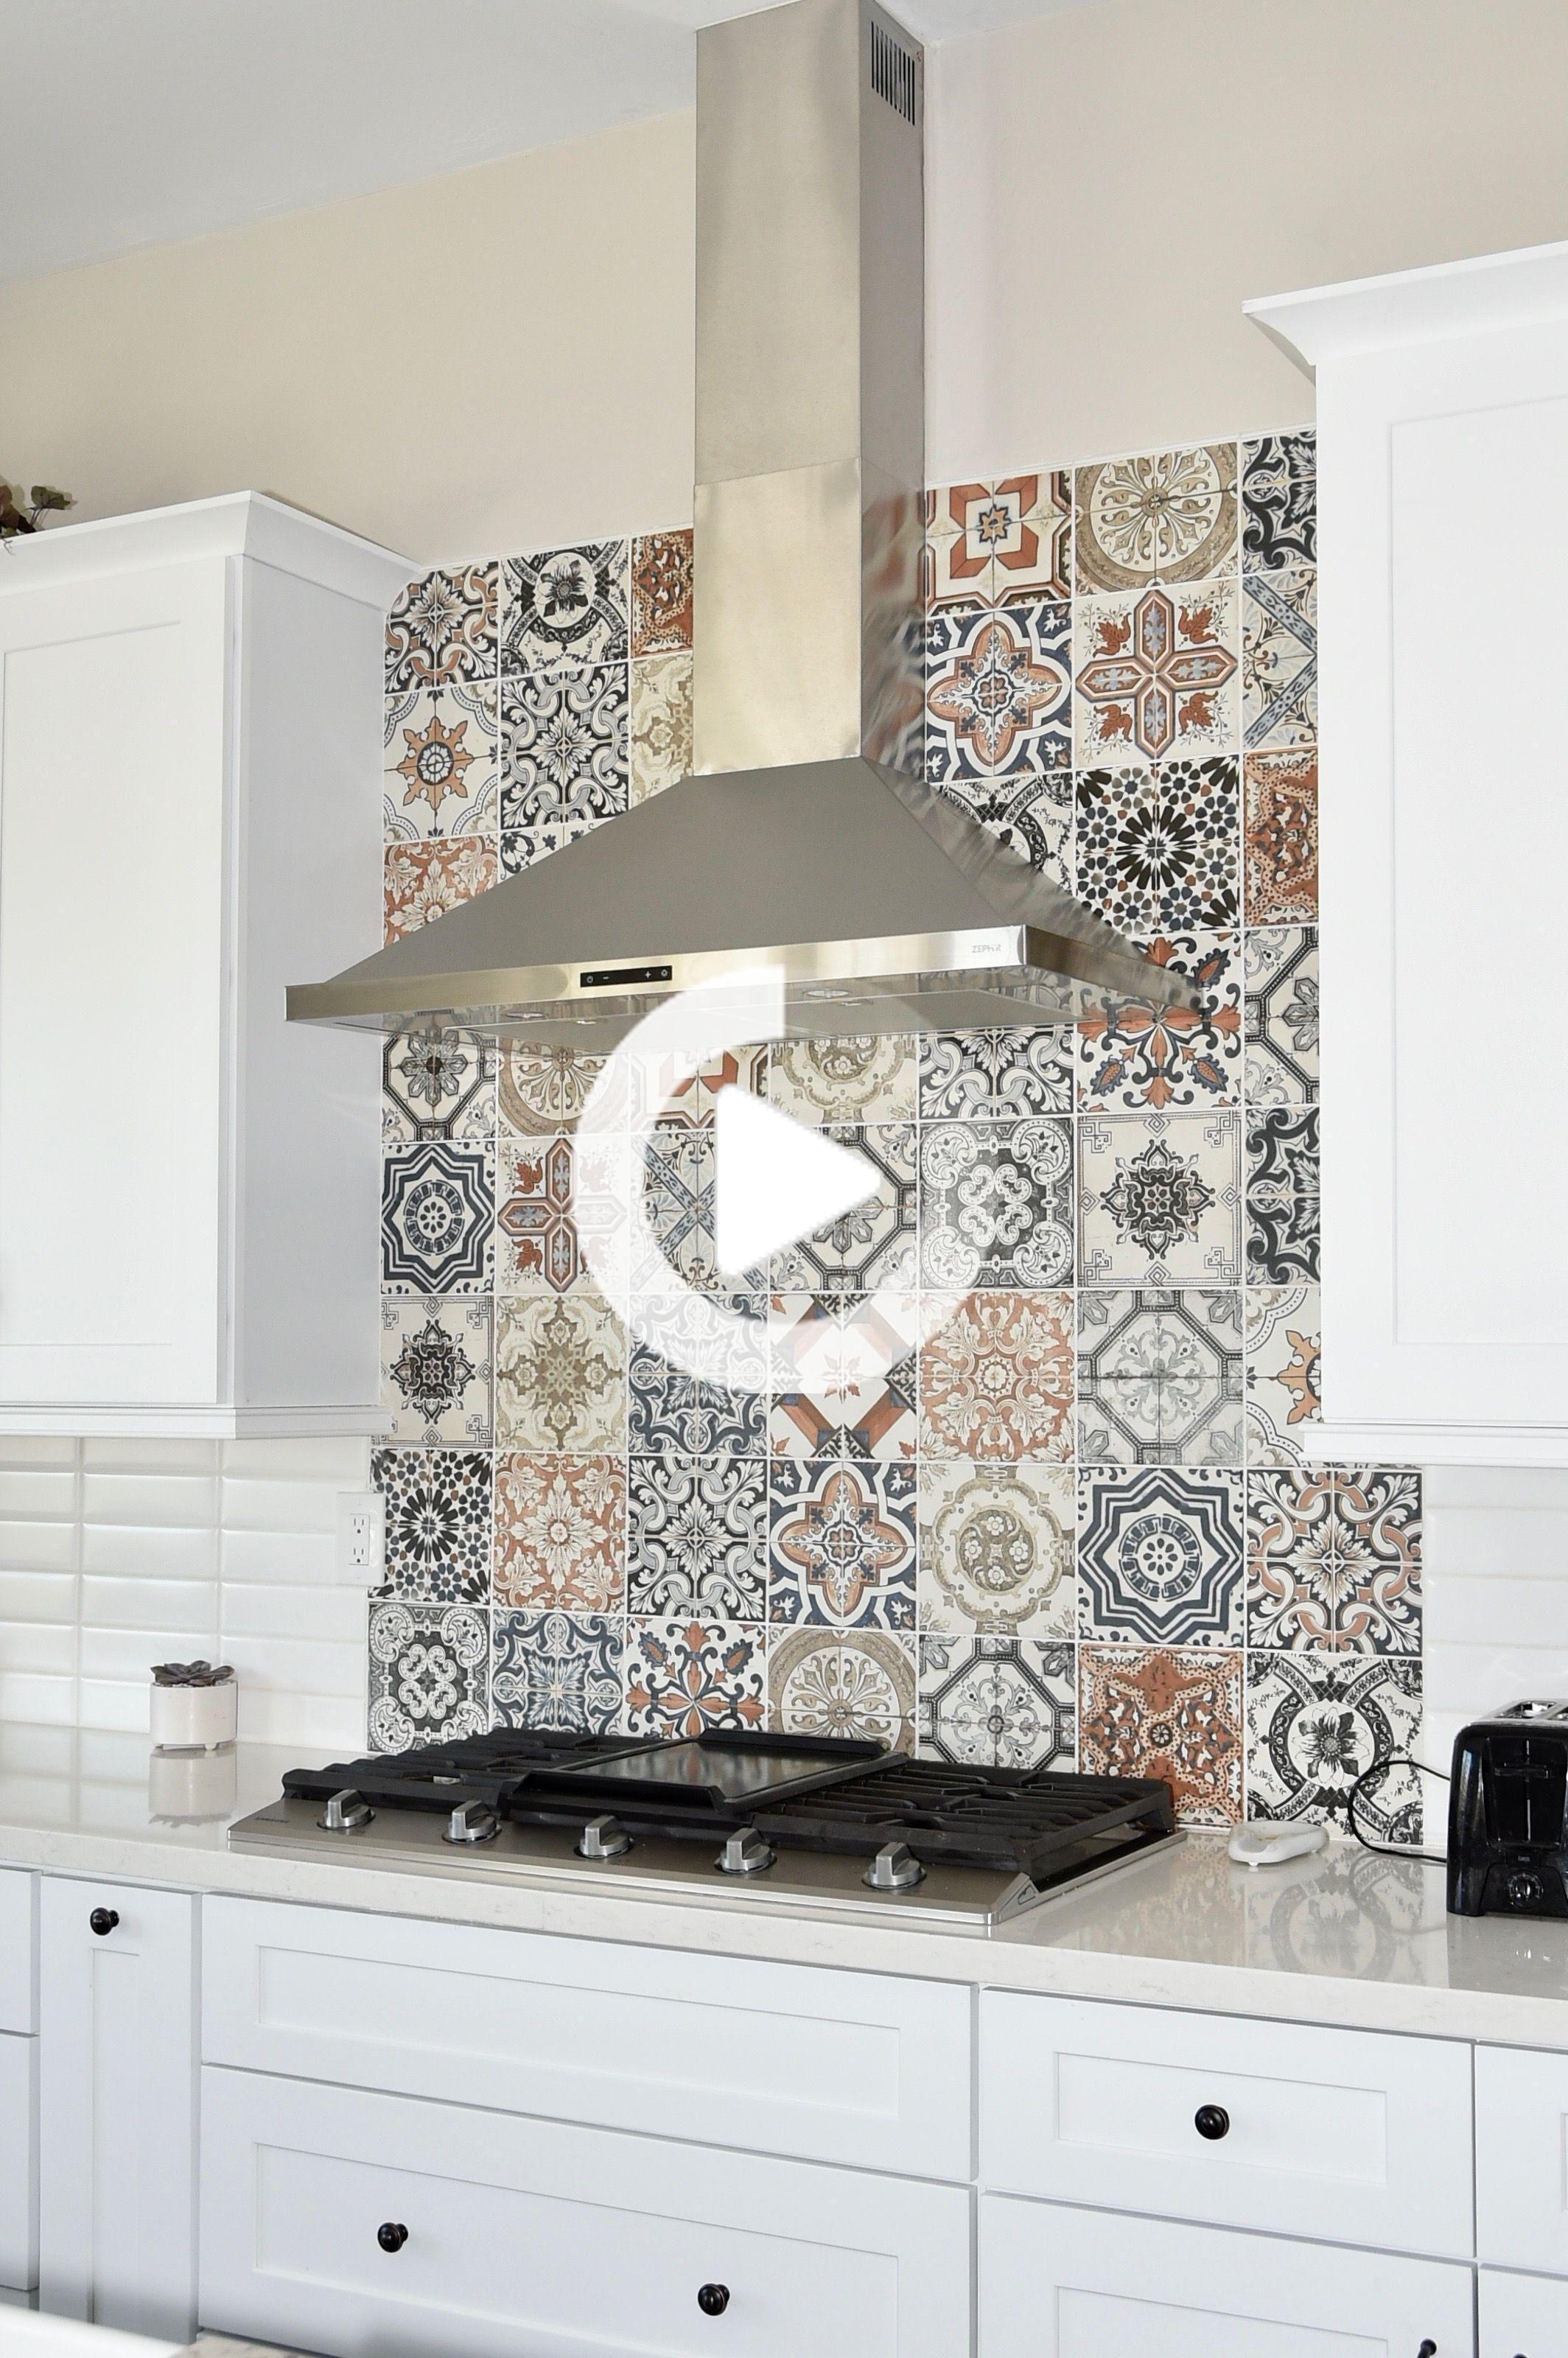 Best Home Remodeling Company | Scottsdale Kitchen & Bath Remodeling